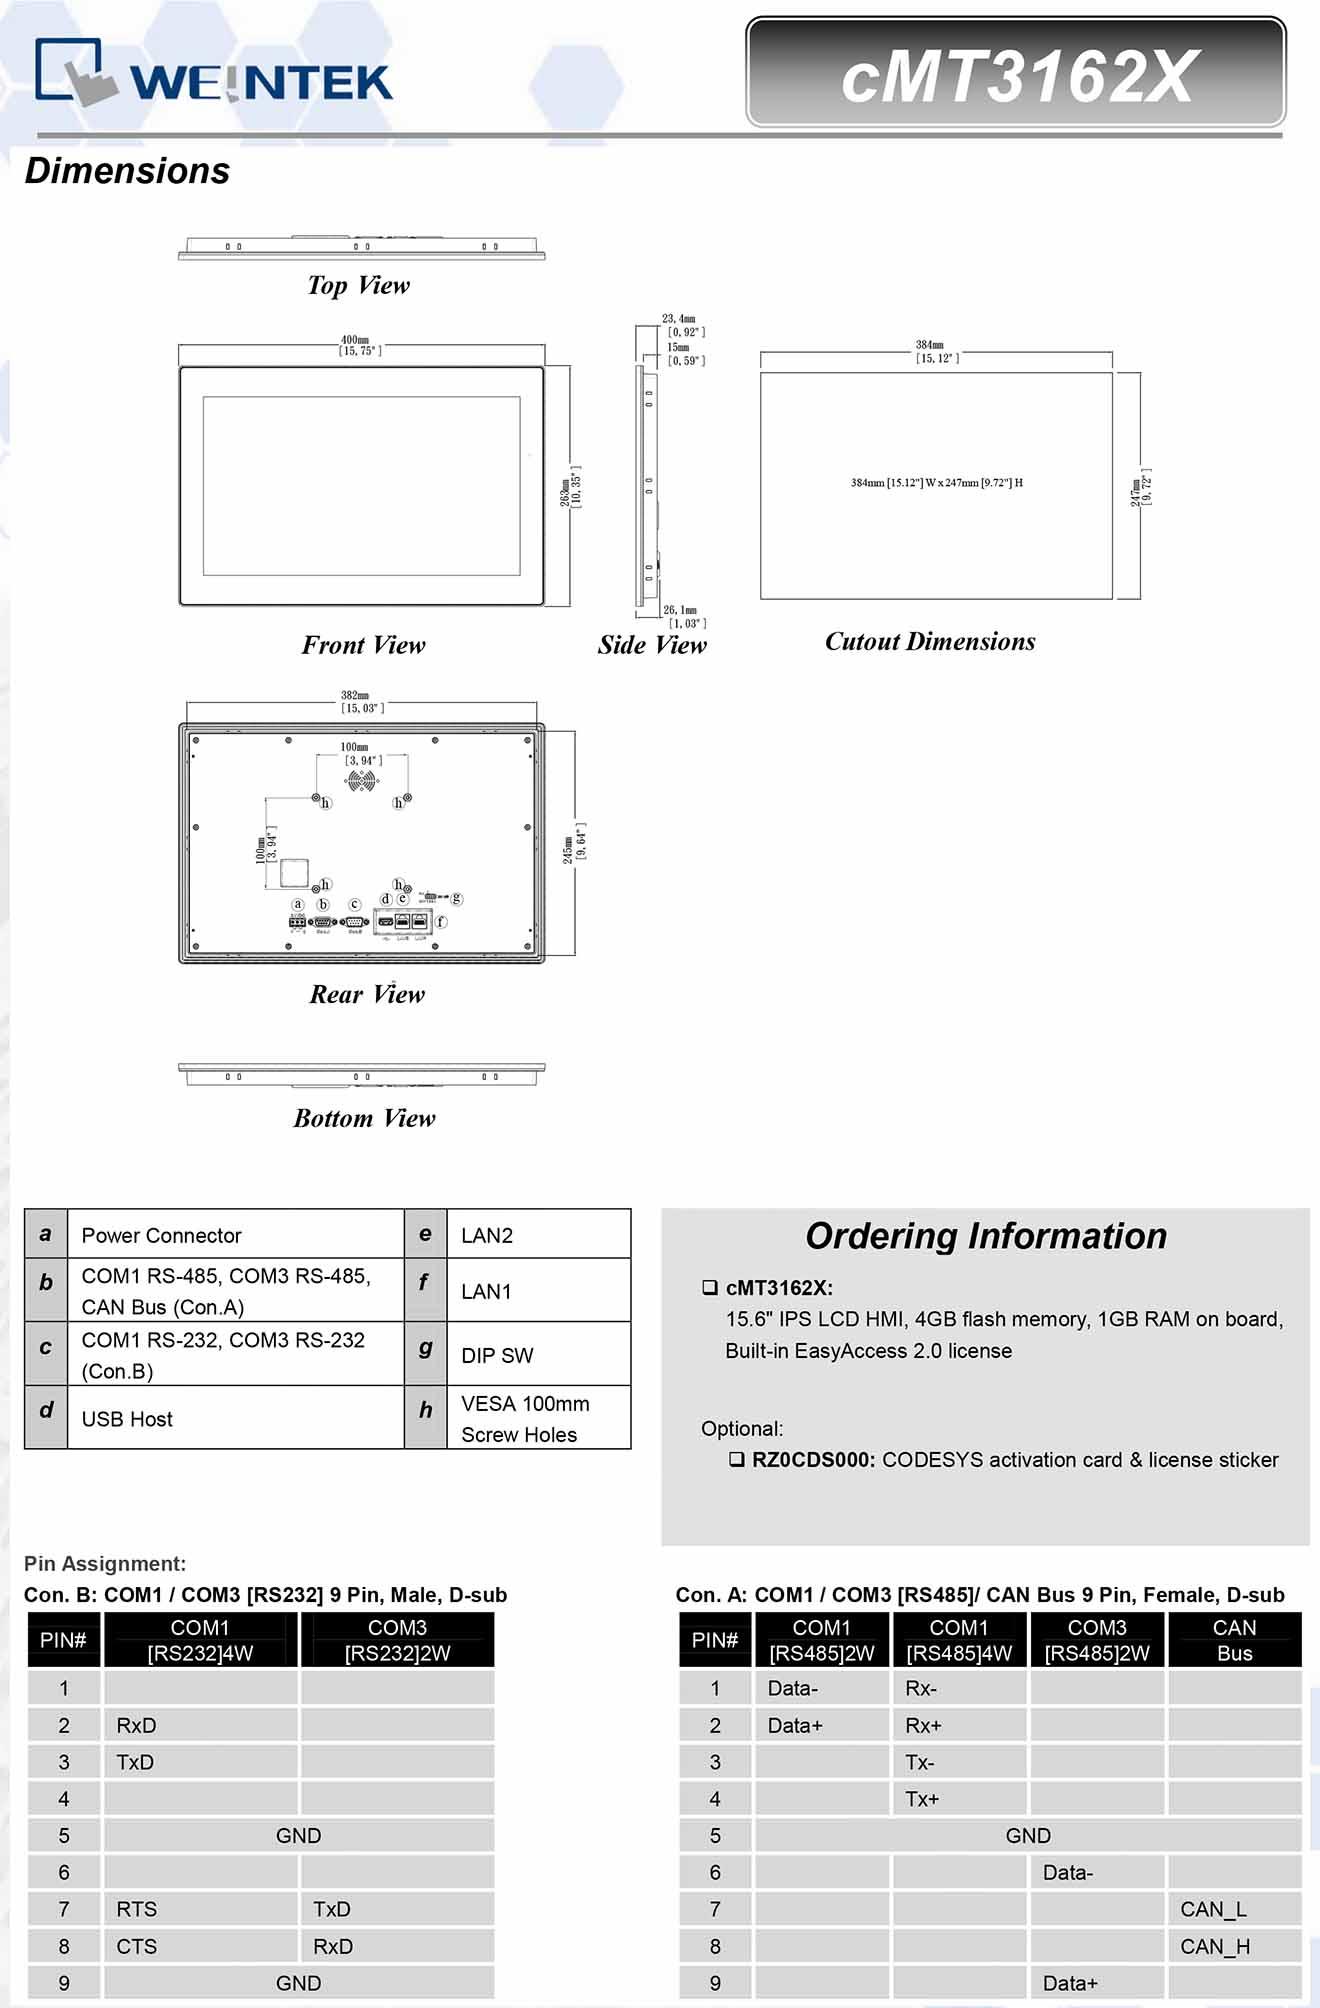 cMT3162X Màn hình cảm ứng HMI Weintek cMT 15.6 IPS Màu CAN Bus, Audio